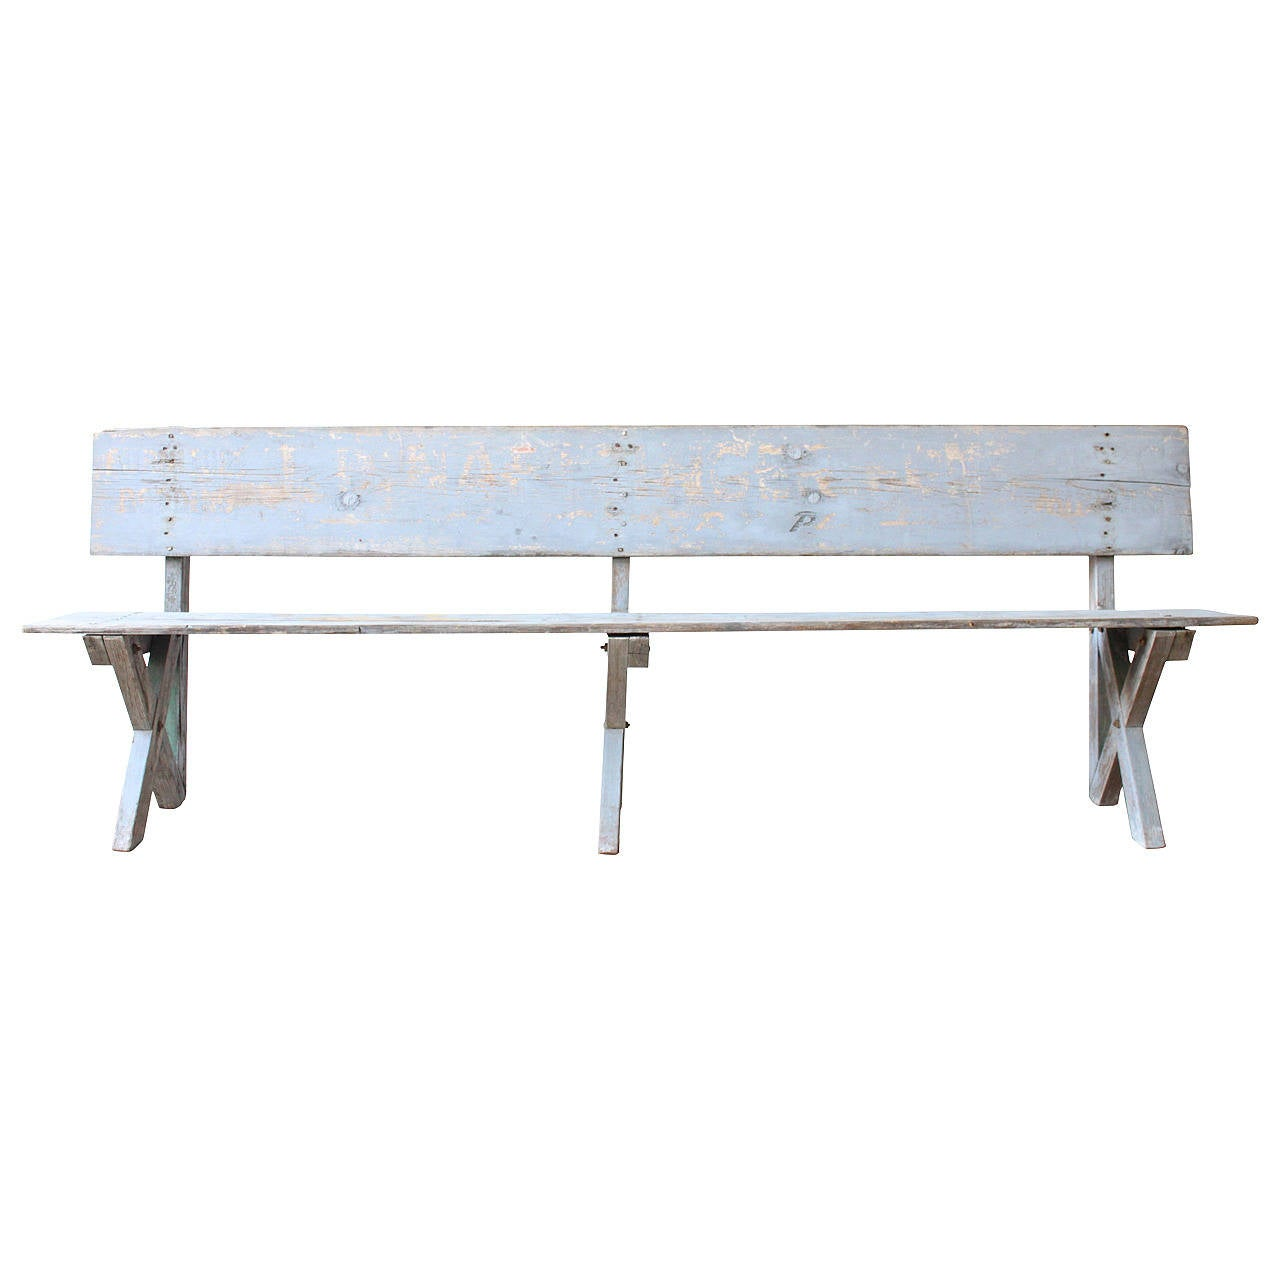 Primitive Pine Work Bench With Backrest At 1stdibs